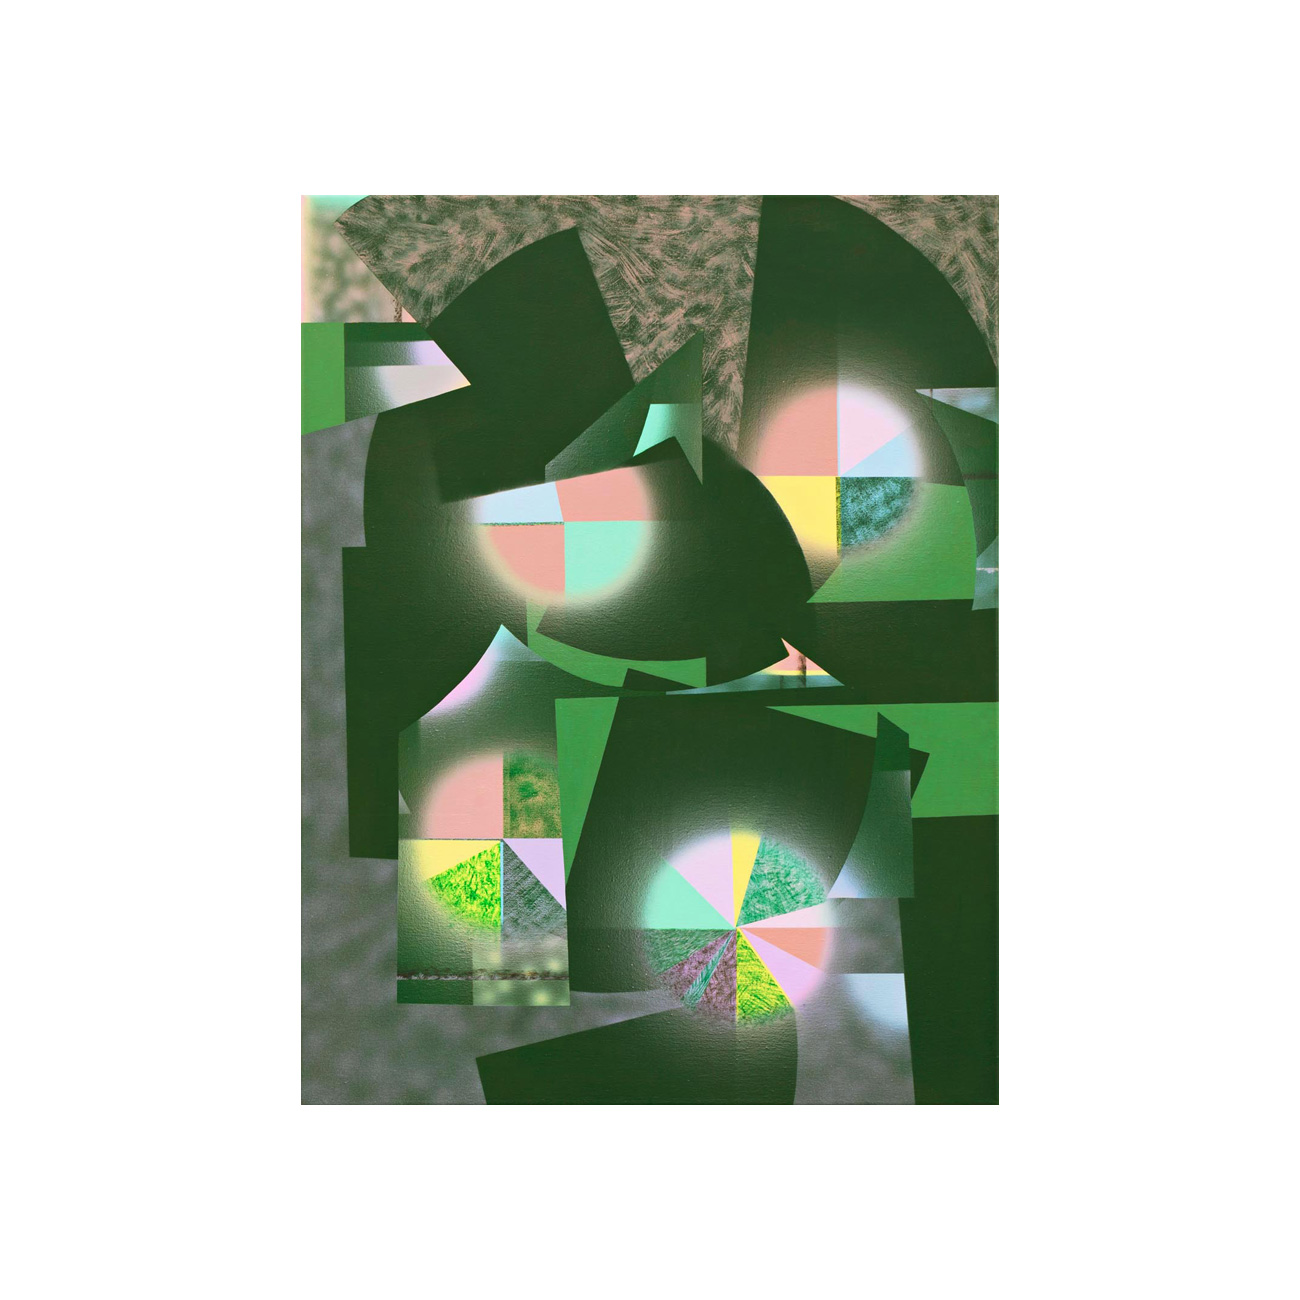 grünes Pastellbild . 2012 . 94 x 72 cm . Acryl auf Baumwolle